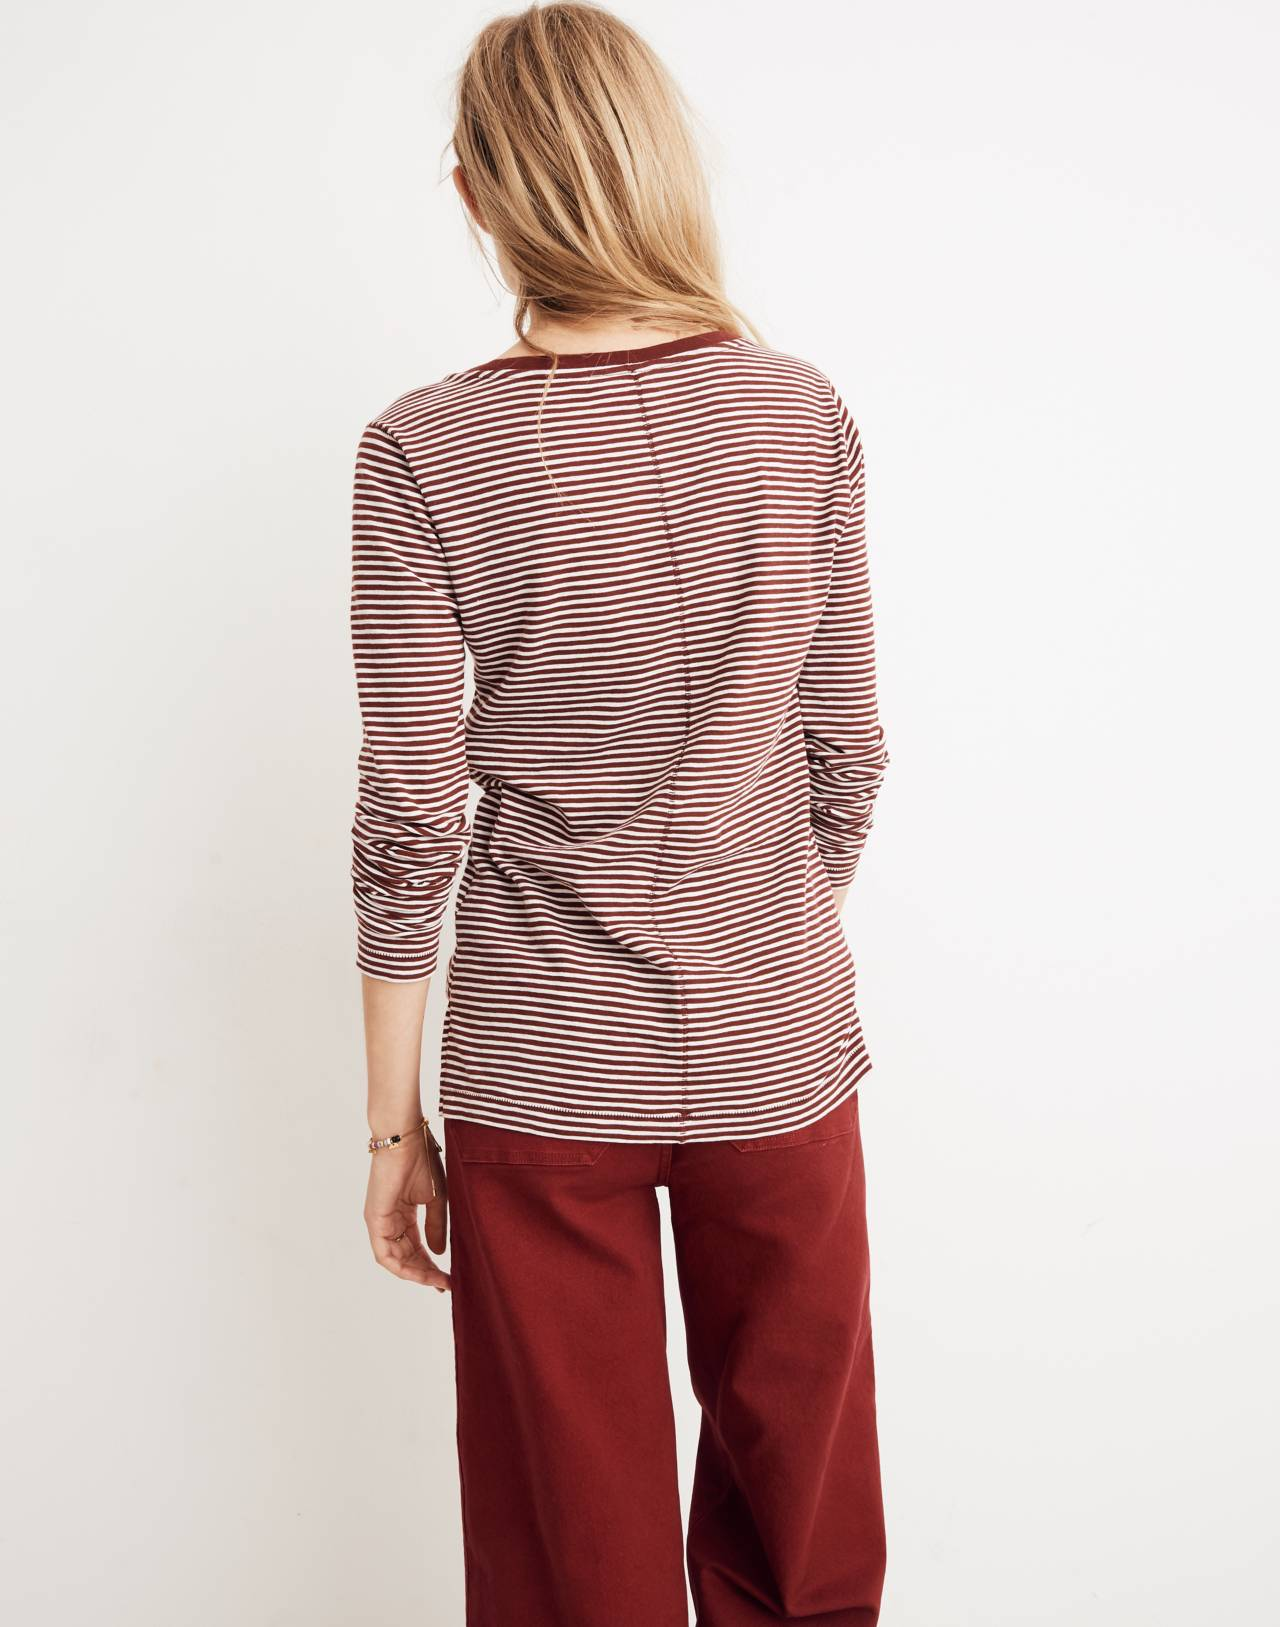 Whisper Cotton Long-Sleeve Crewneck Tee in Daniela Stripe in cabernet image 3